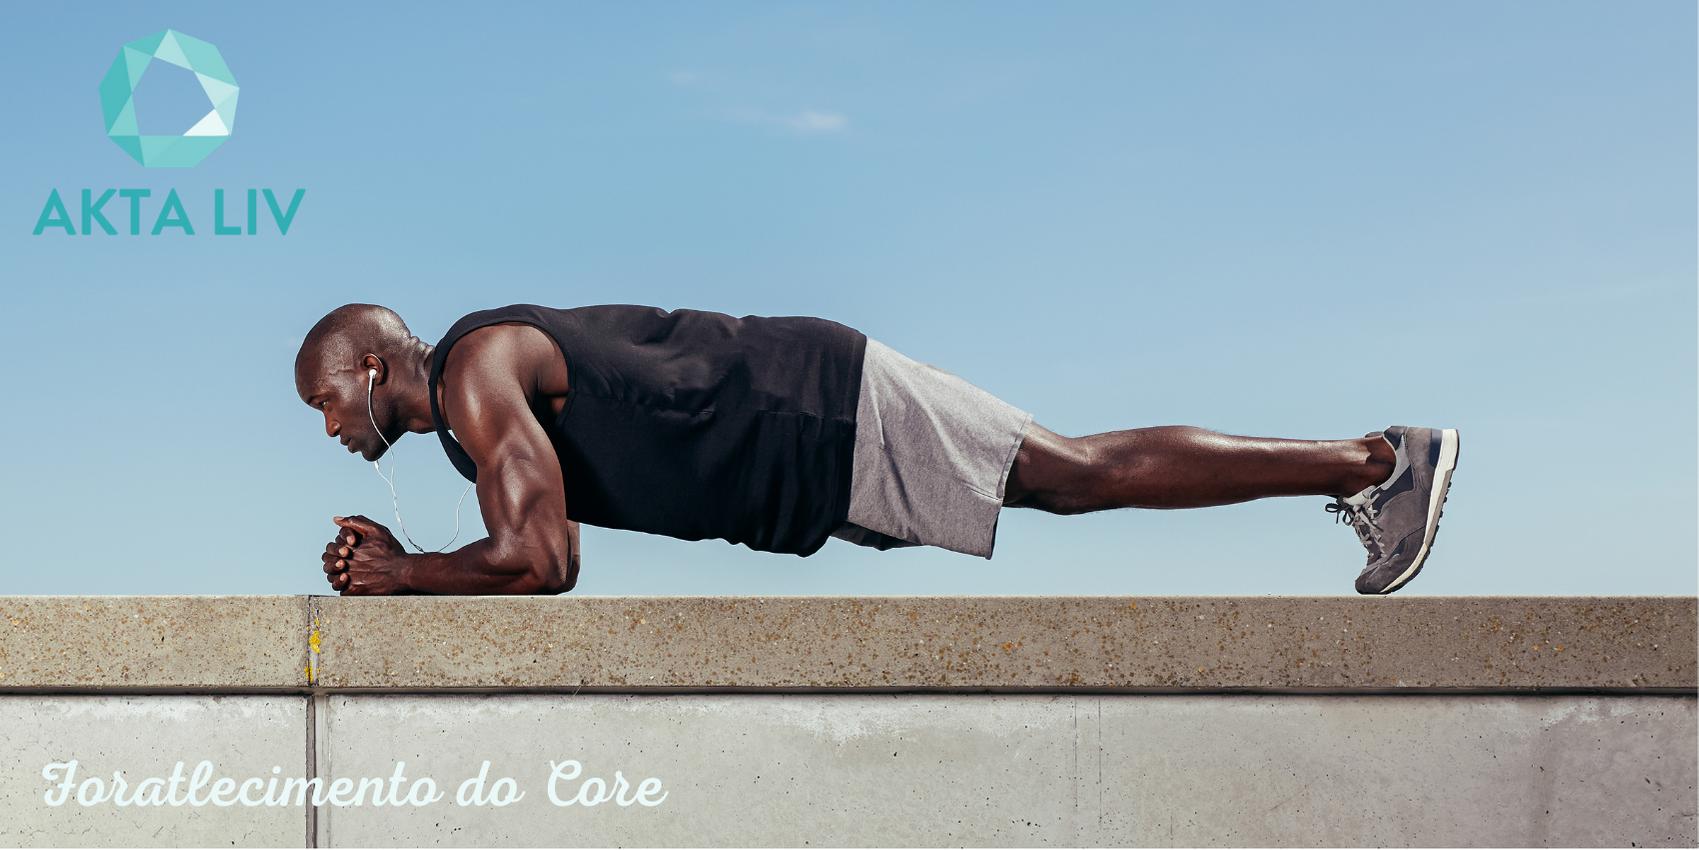 Fisioterapia - pilates - ft. guilherme abreu - fortalecimento do core - core